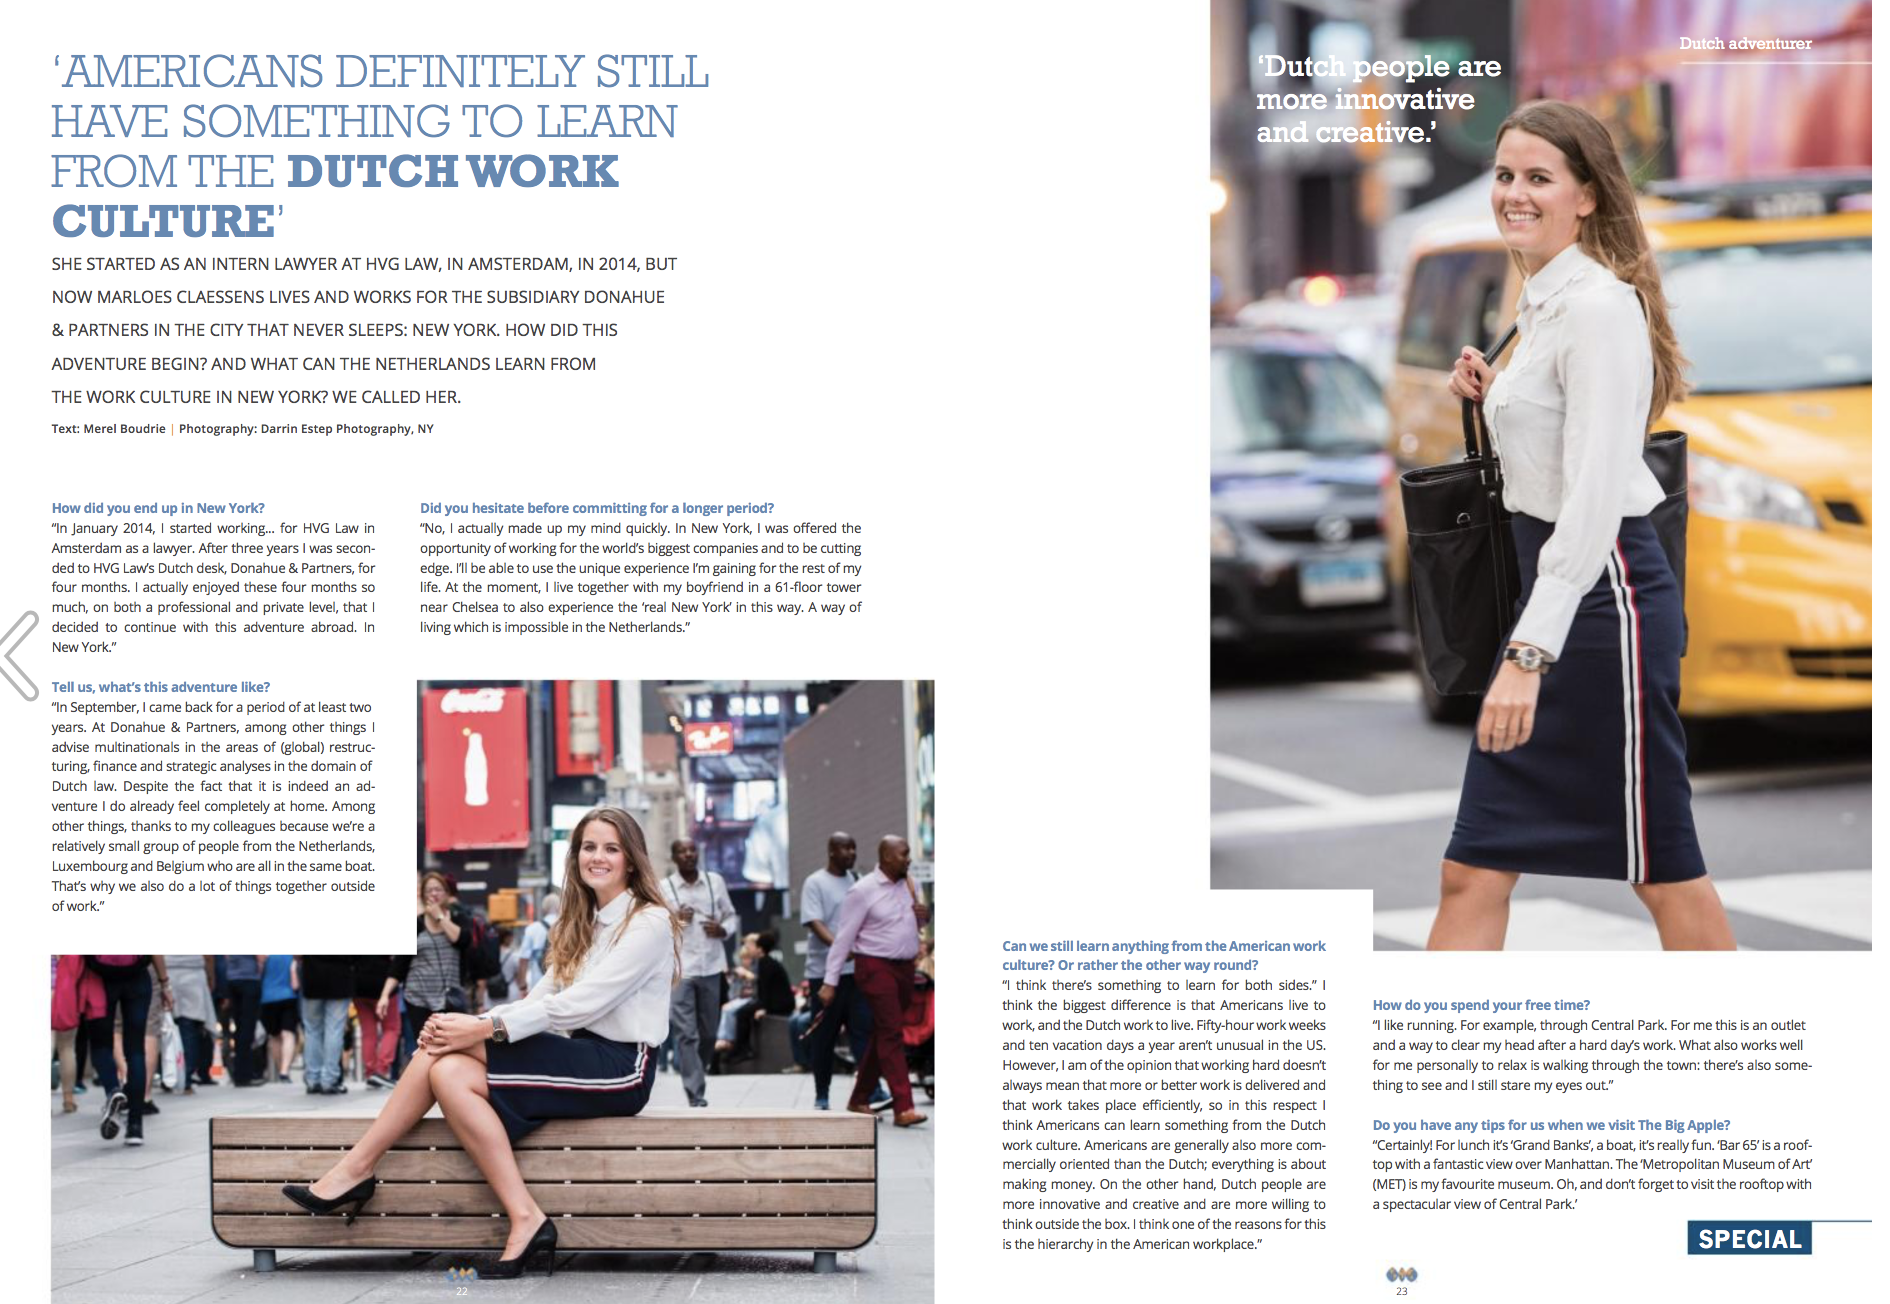 World Trade Center Netherlands Alliance Magazine #6 - Full Article